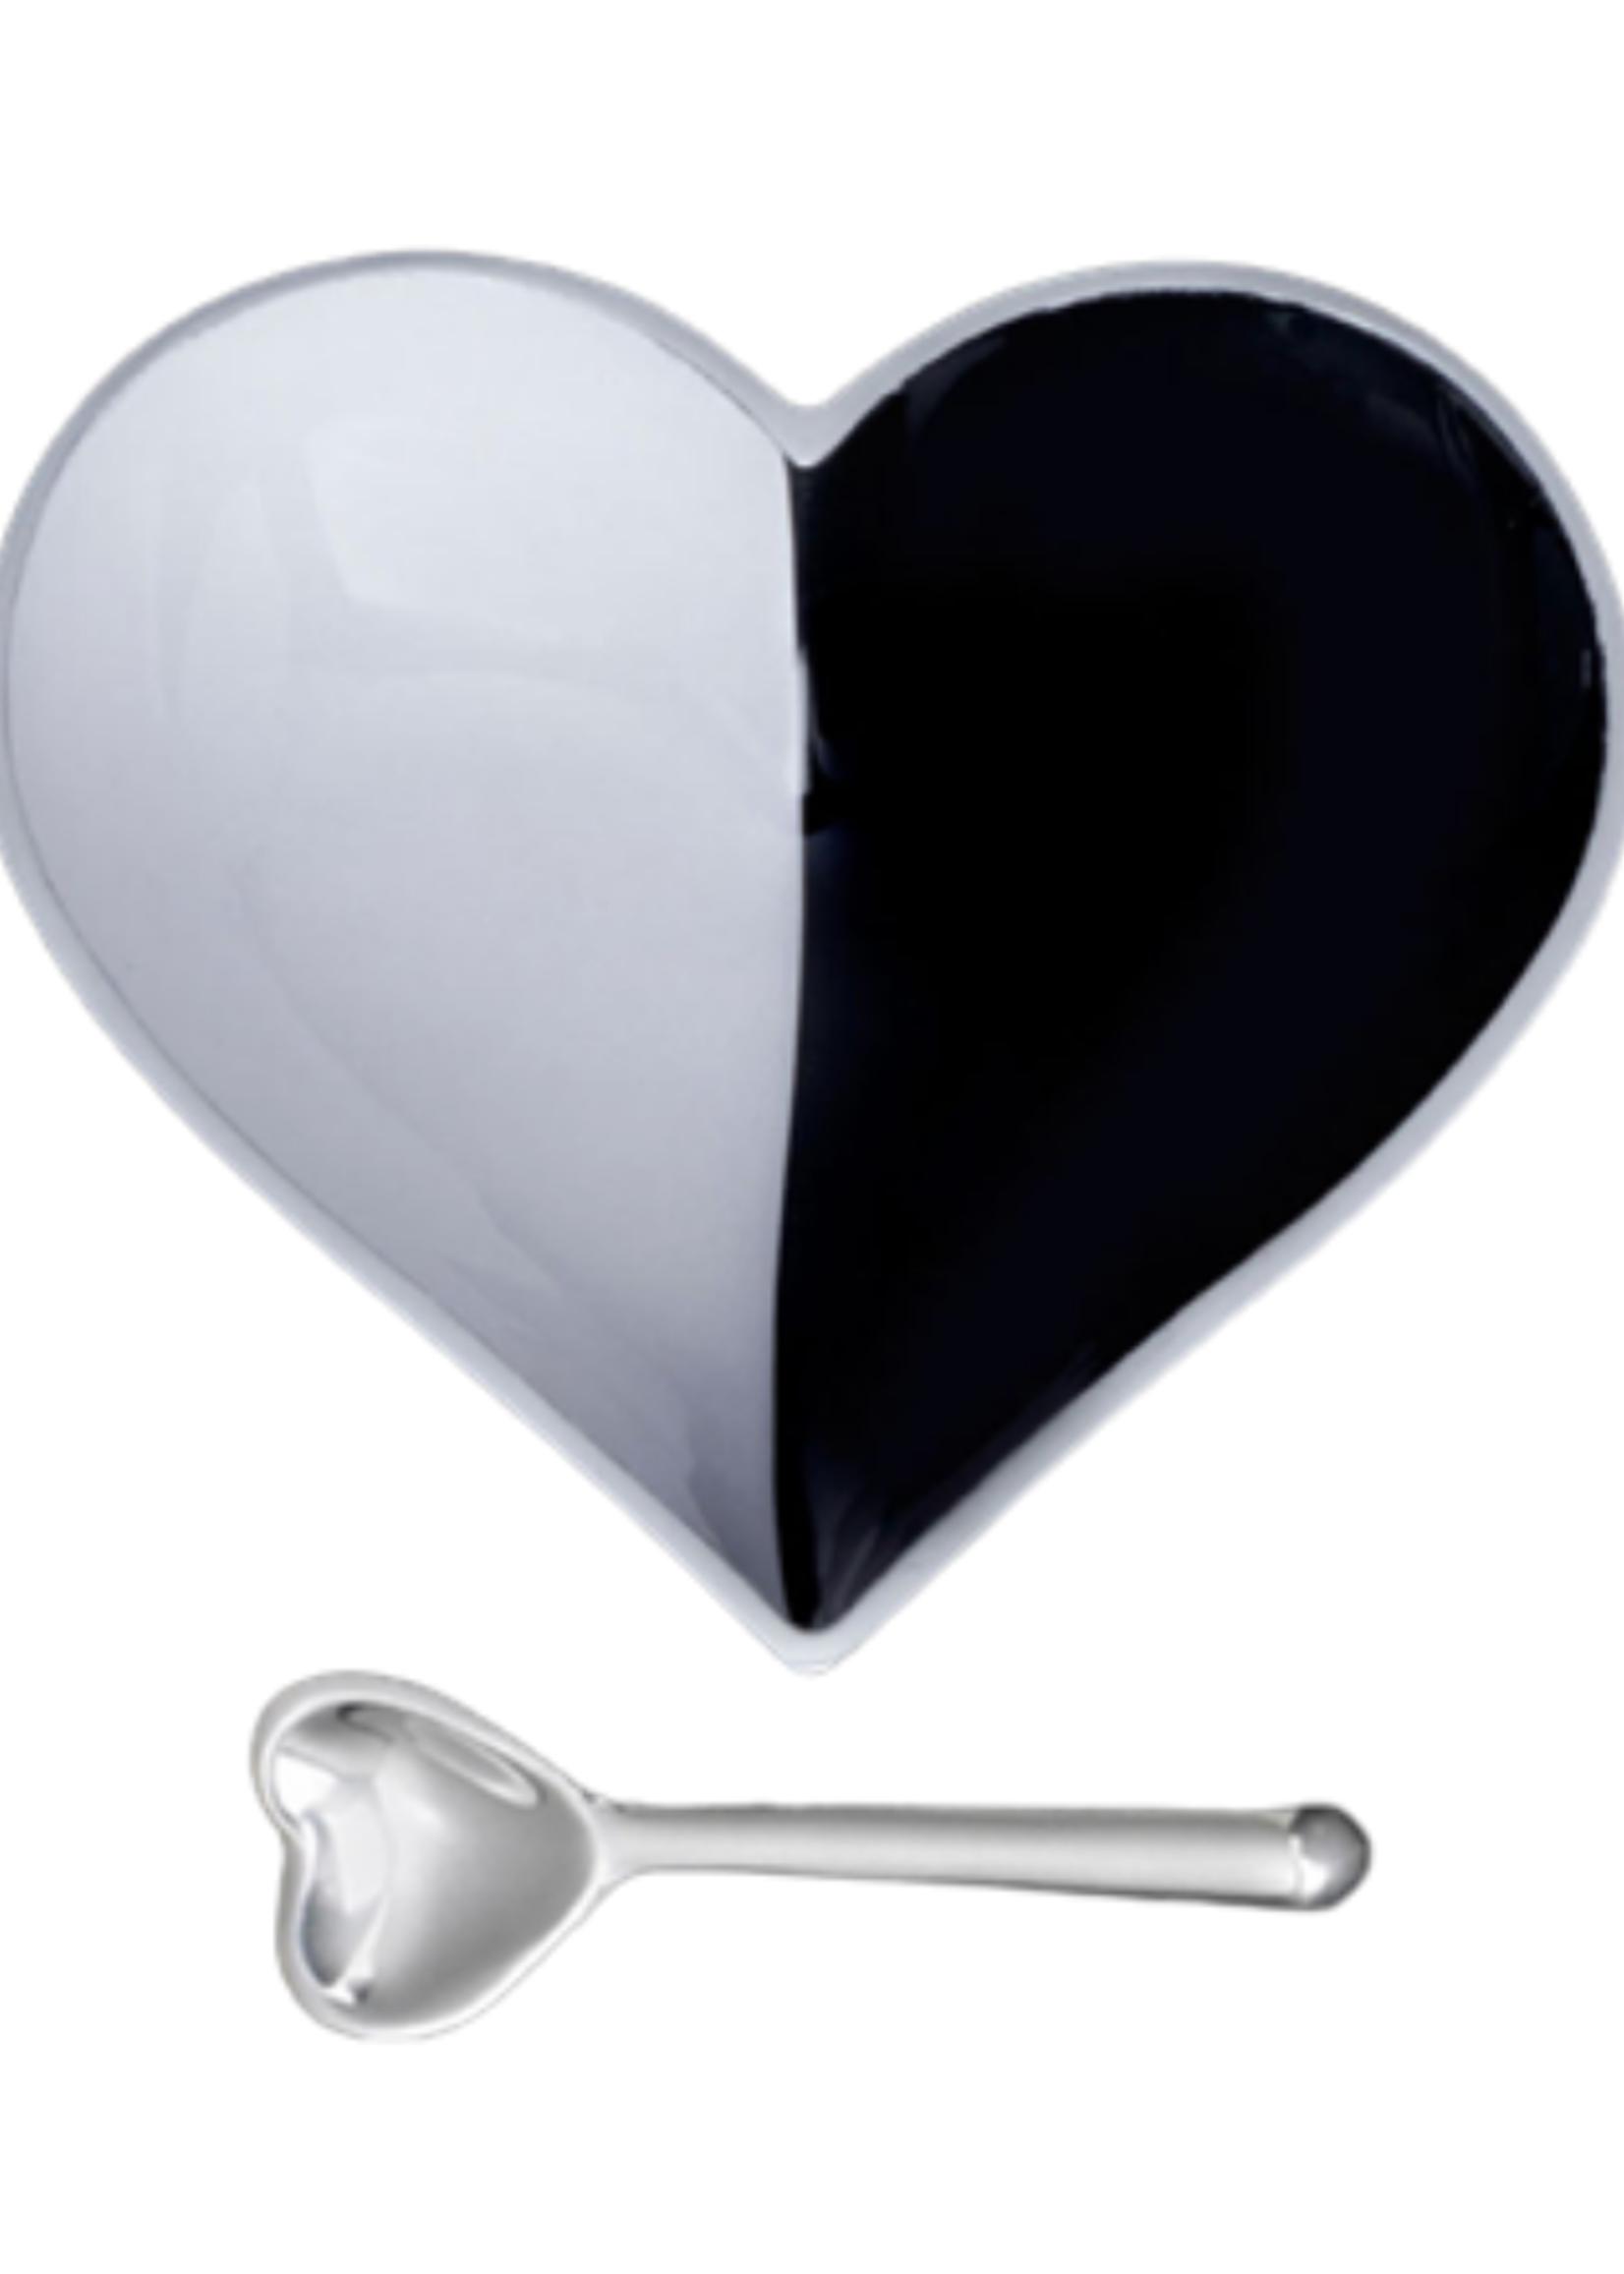 Happy Heart Bowl w Spoon // B/W Cookie